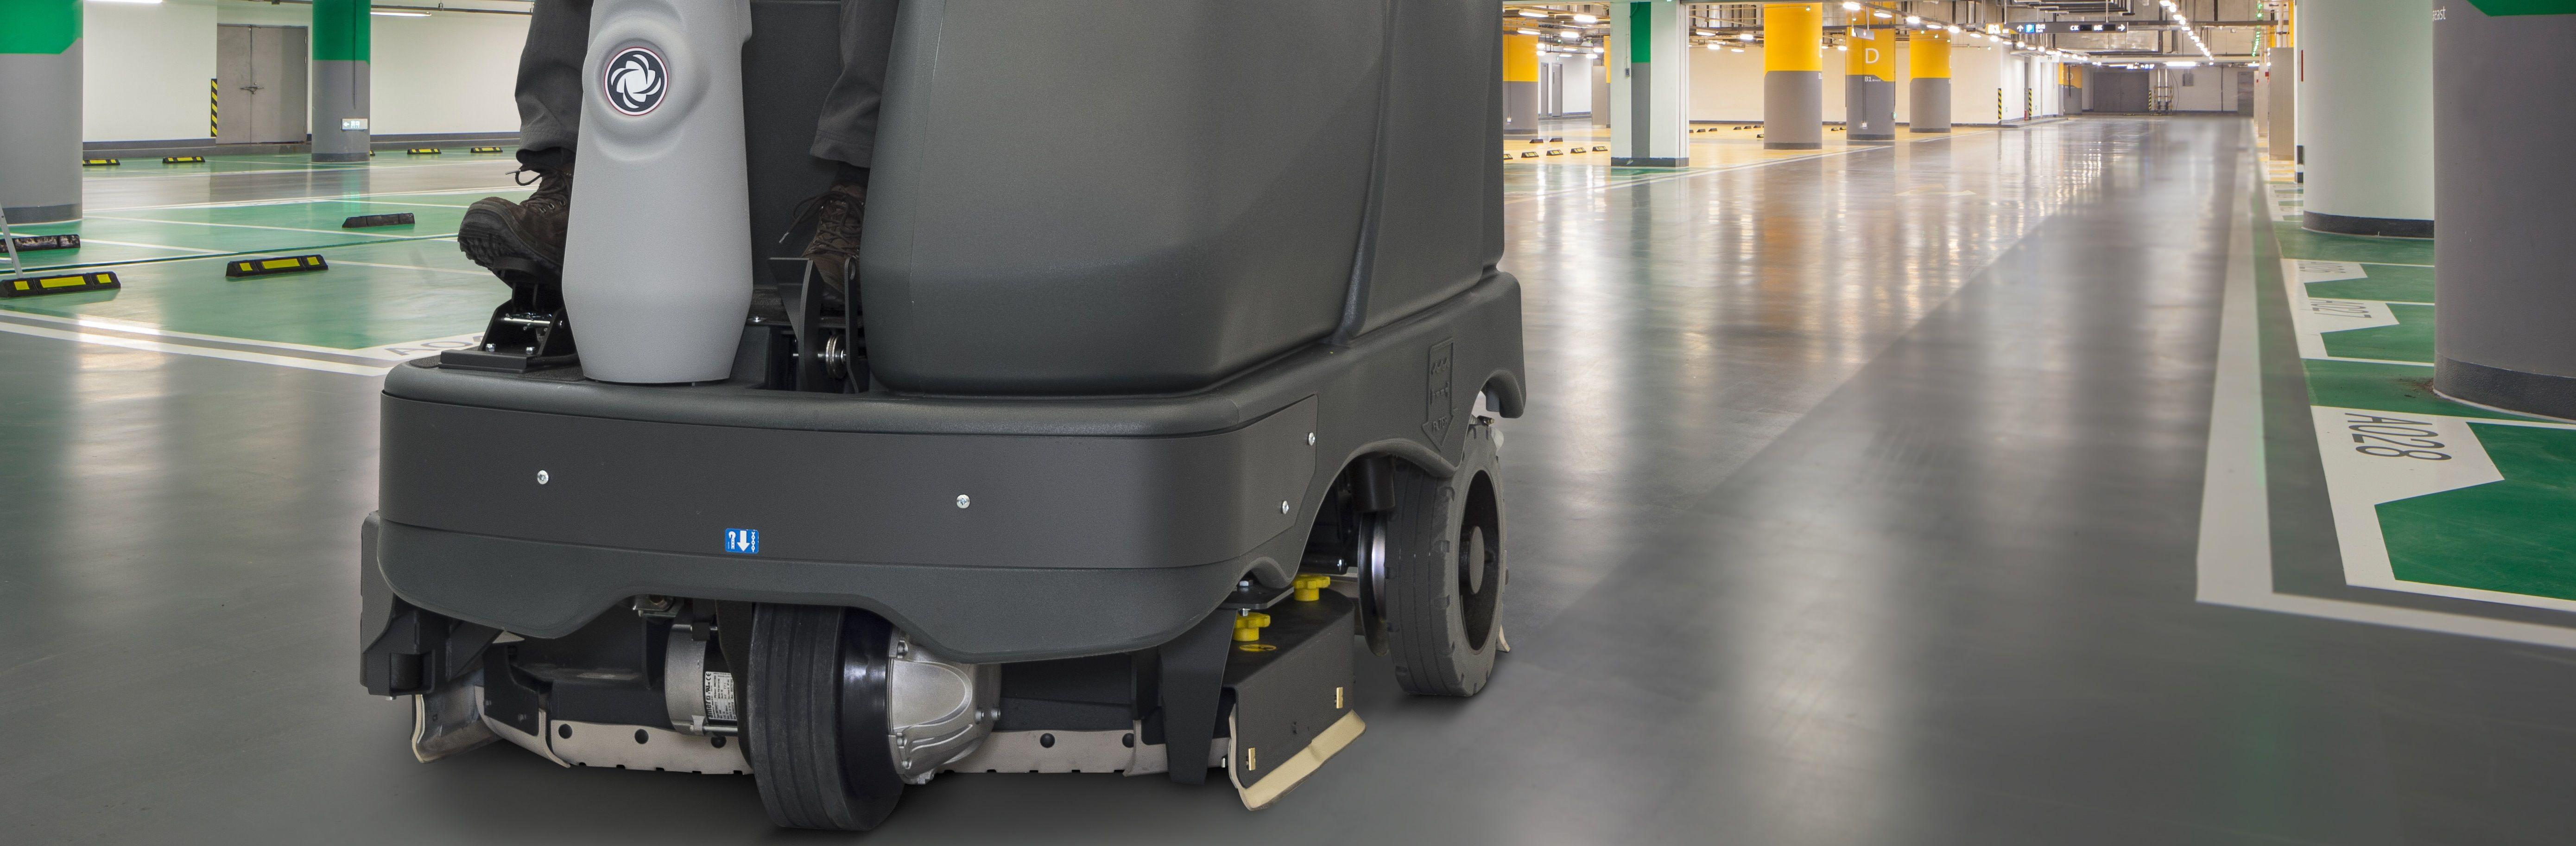 Nilfisk SC6500 Scrubber Dryer Cleaning Internal Carpark